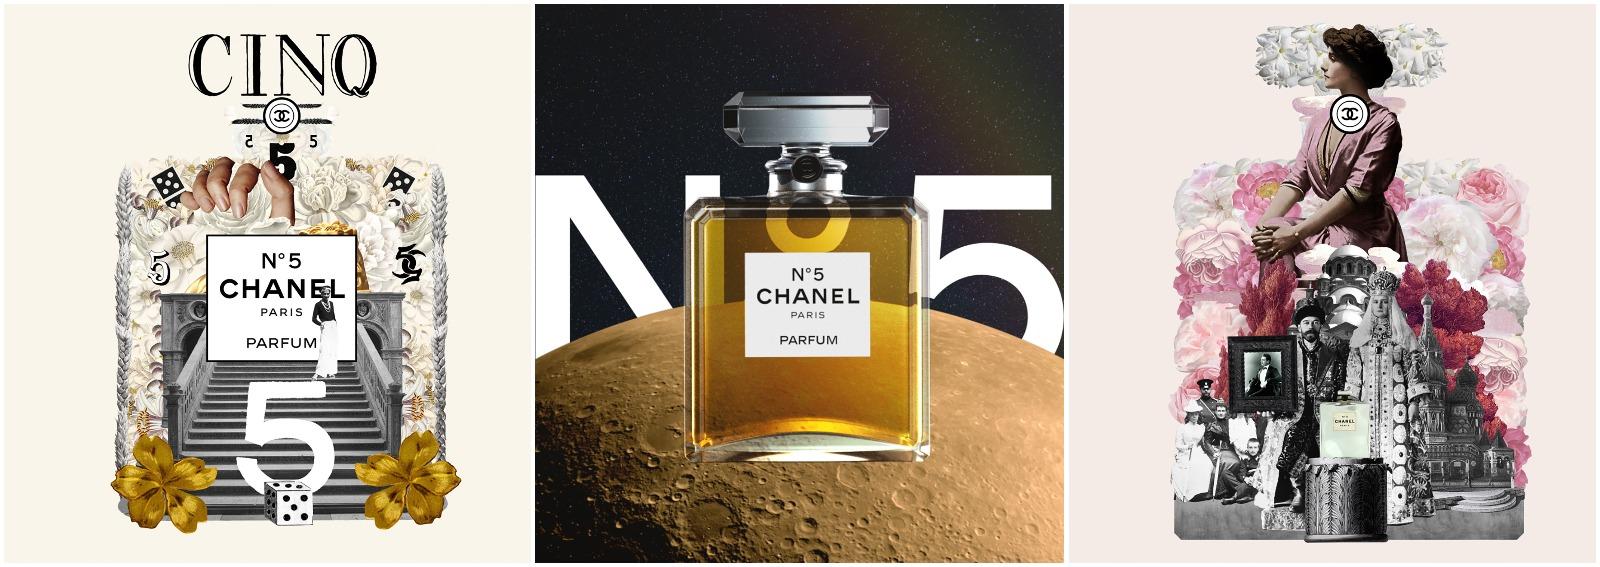 chanel-n-5-2021-cover desktop